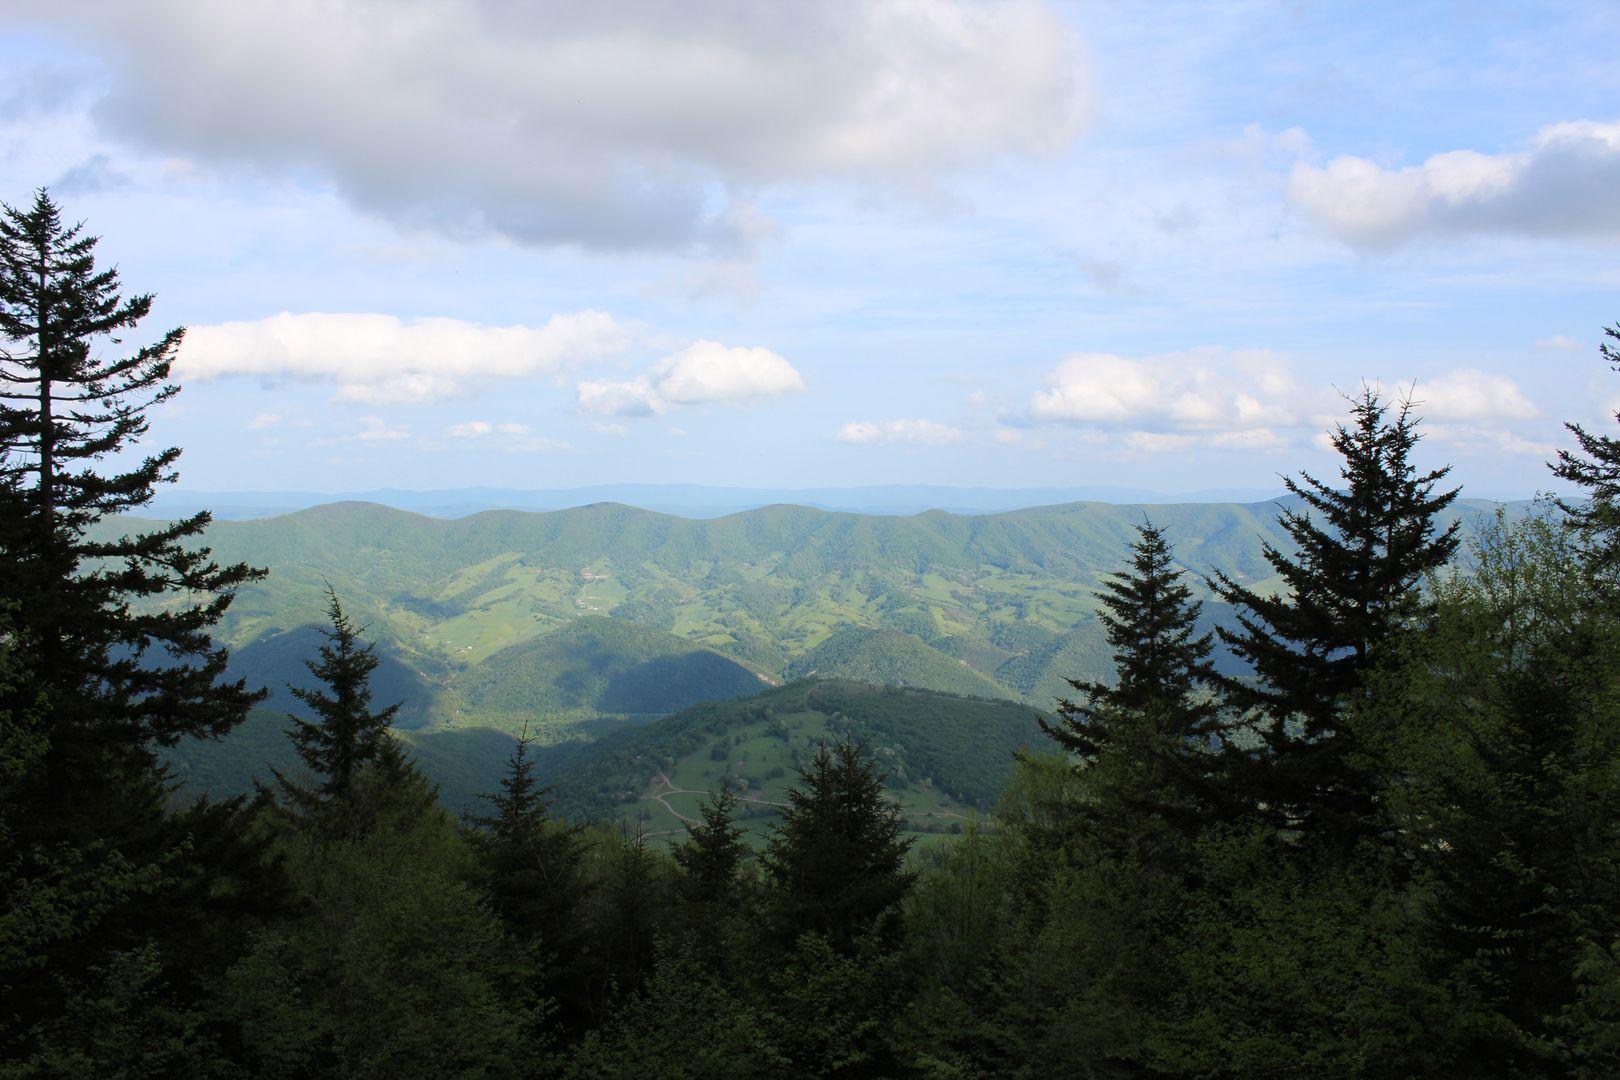 view of mountains through evergreen trees